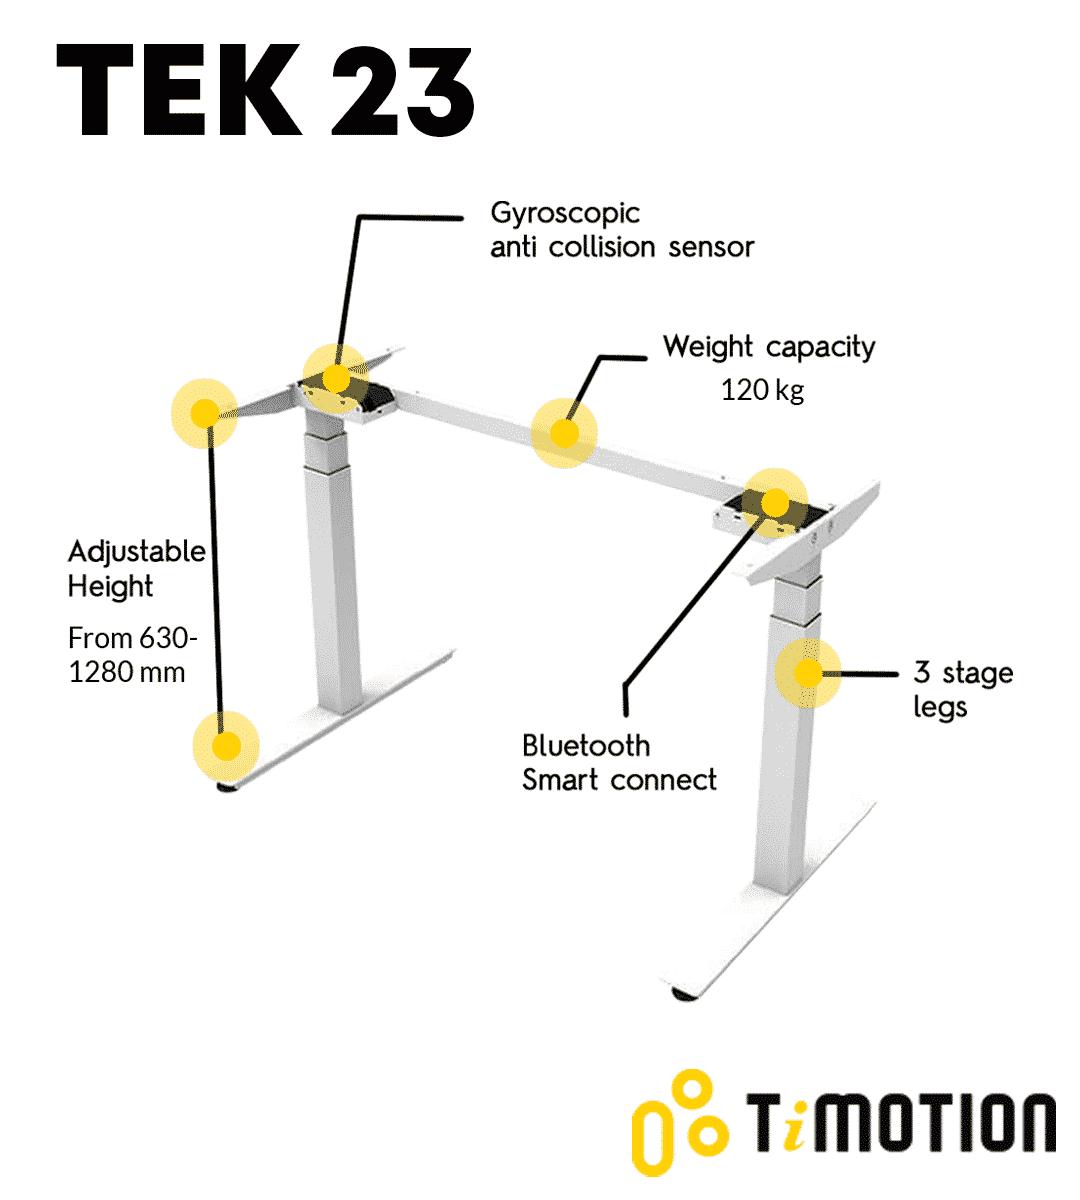 2 TEK23